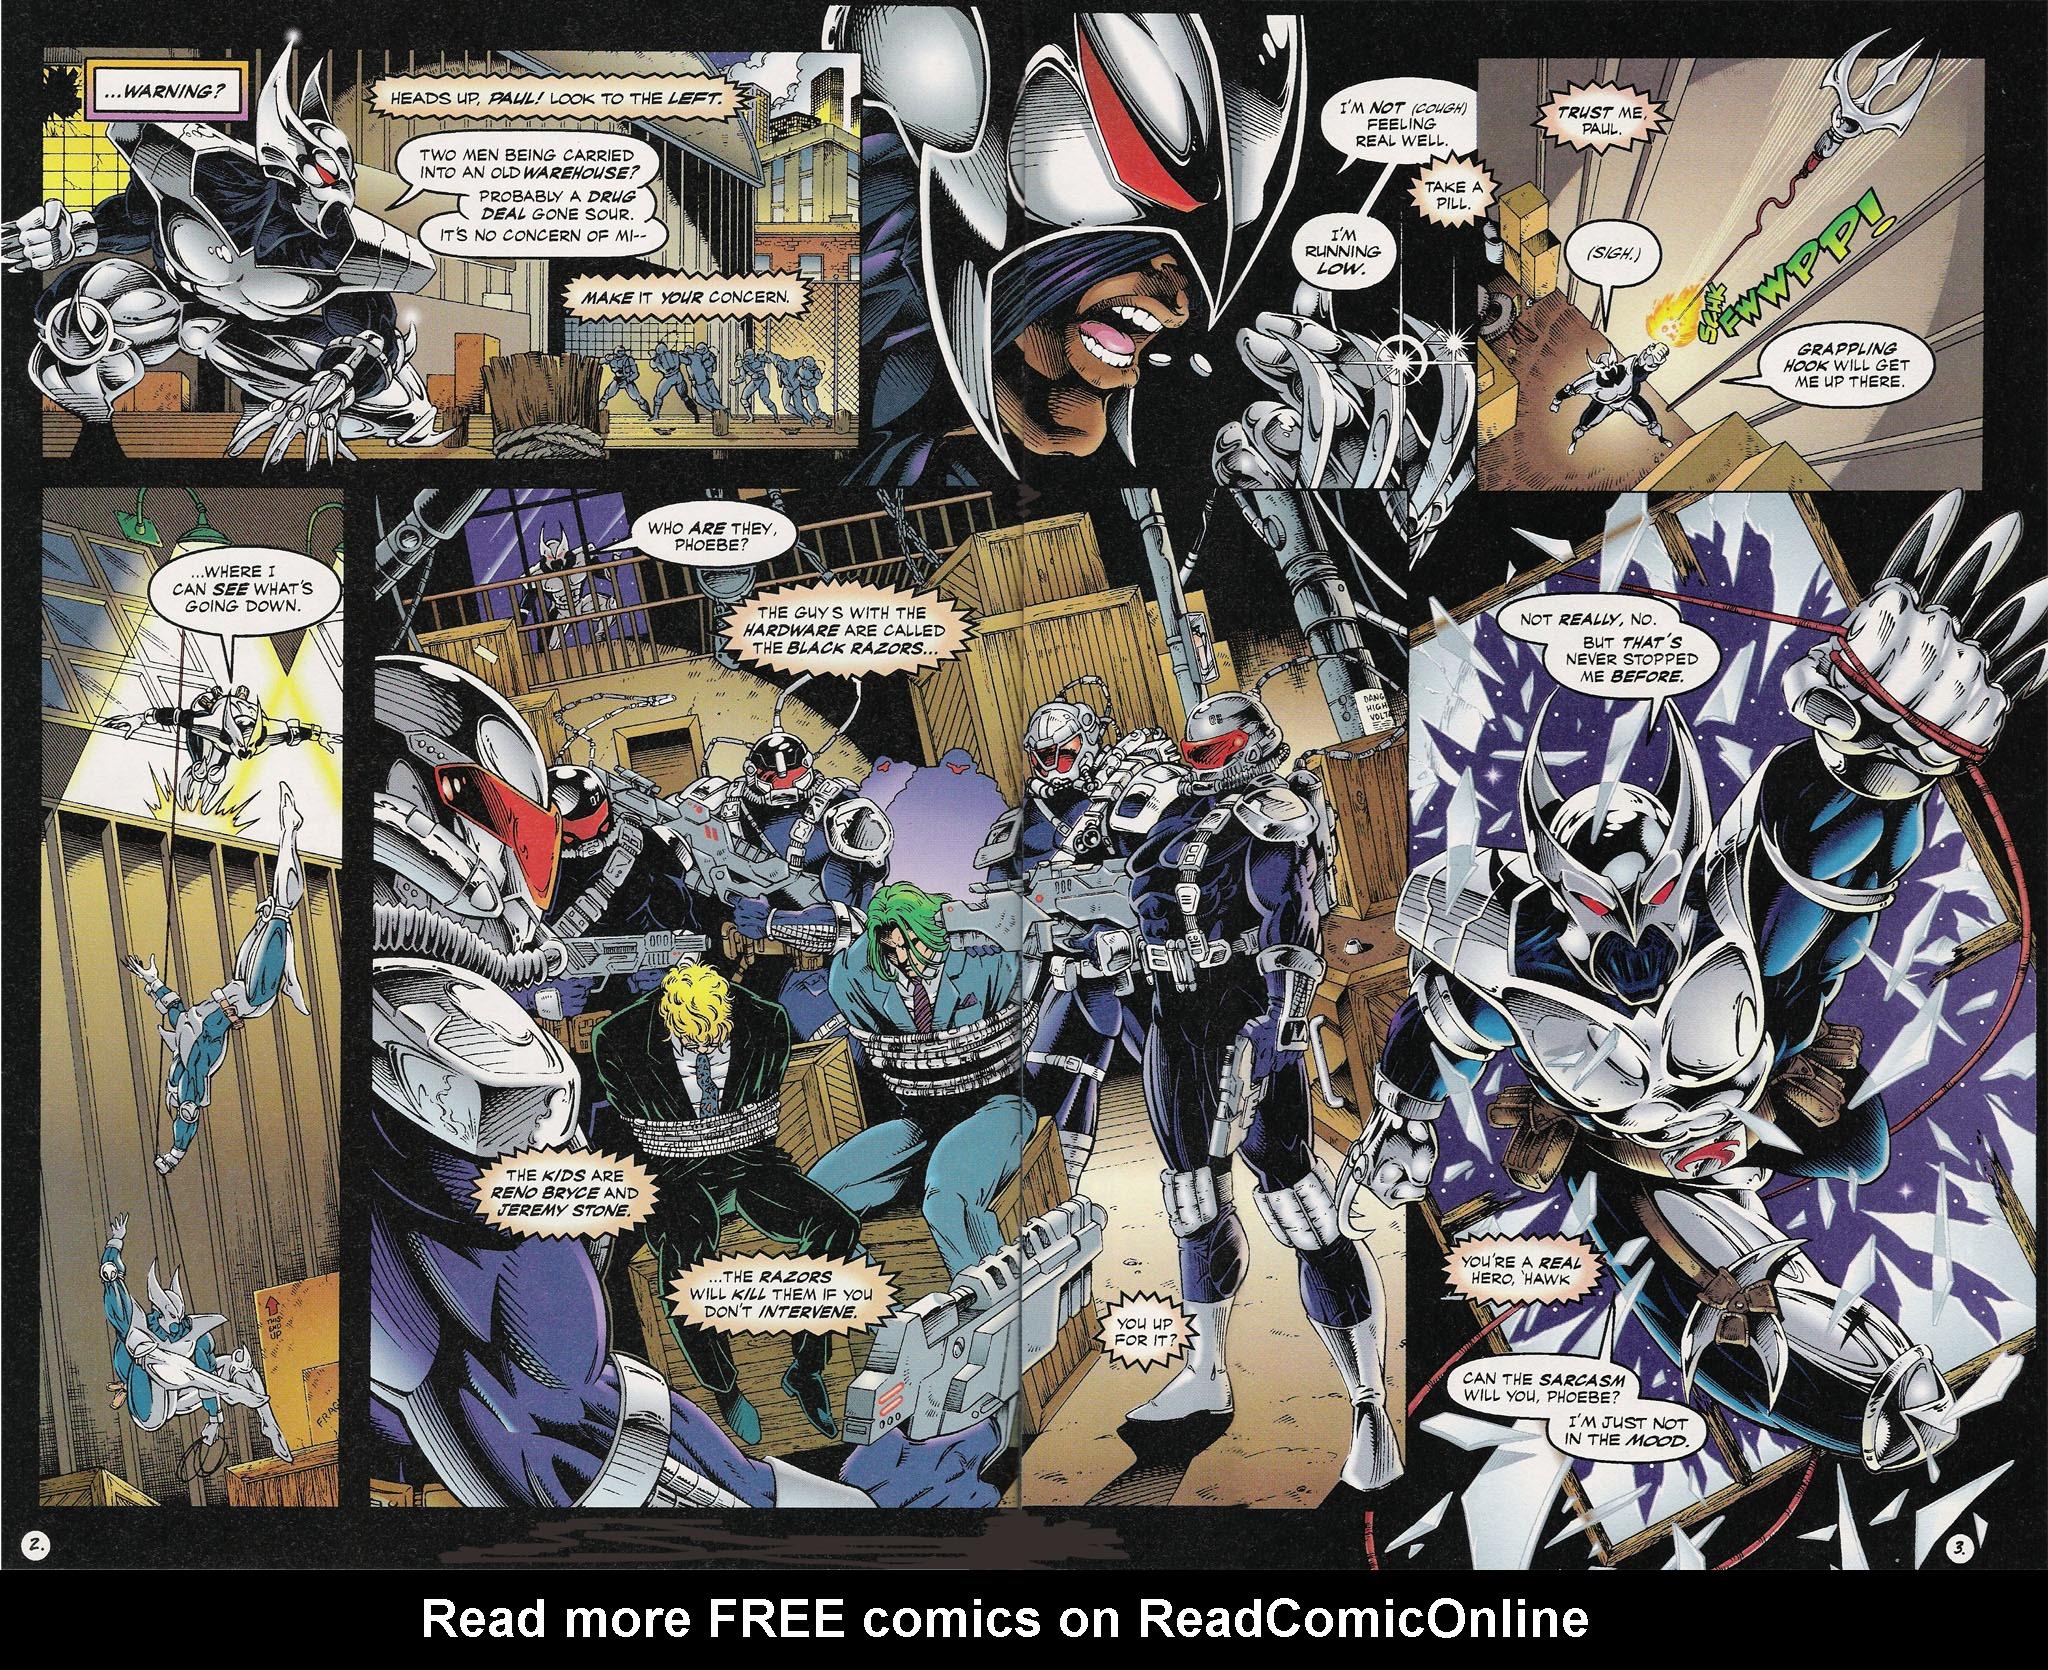 Read online ShadowHawk comic -  Issue #13 - 4